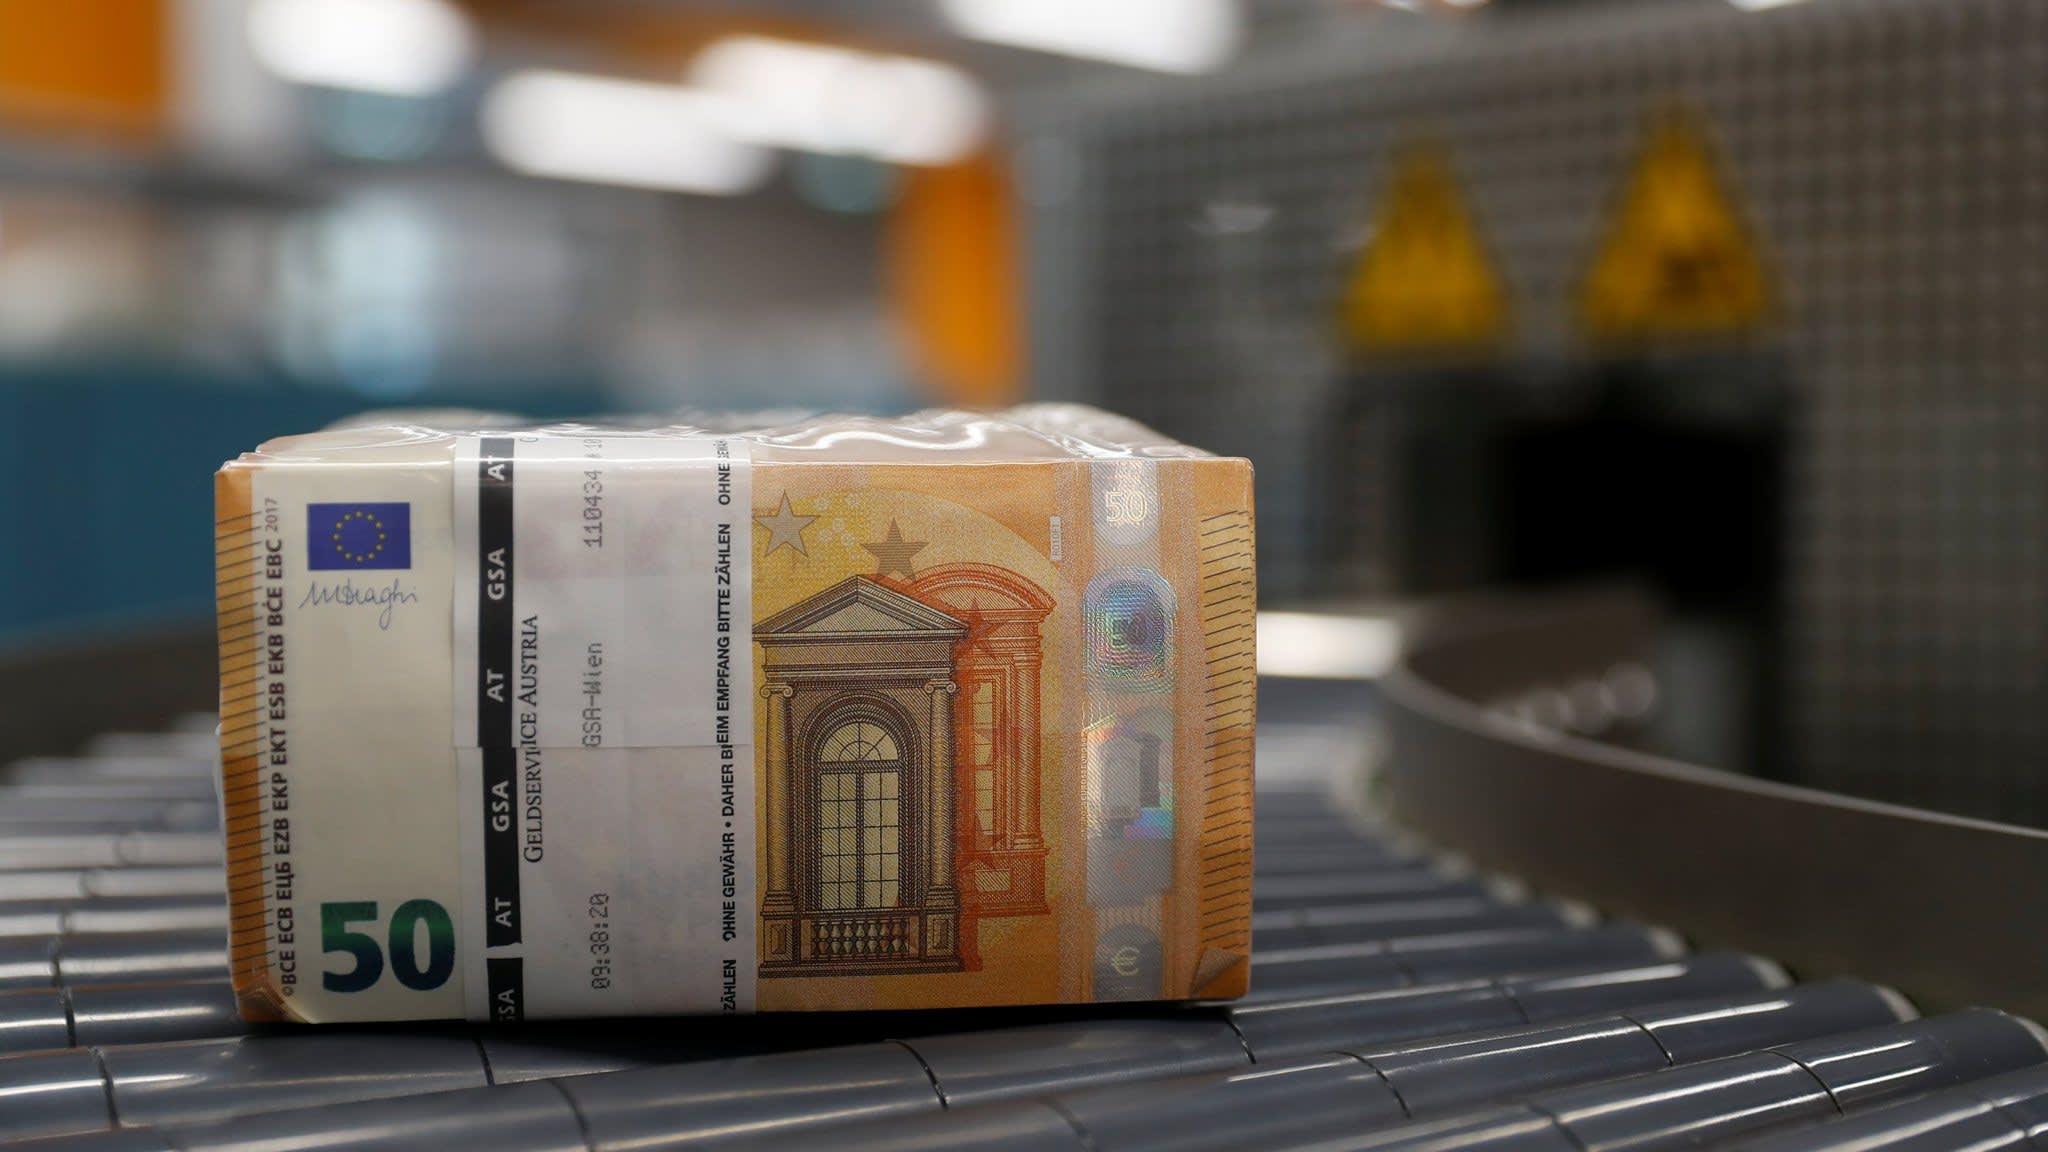 Brussels to propose €50bn raid on ECB profits